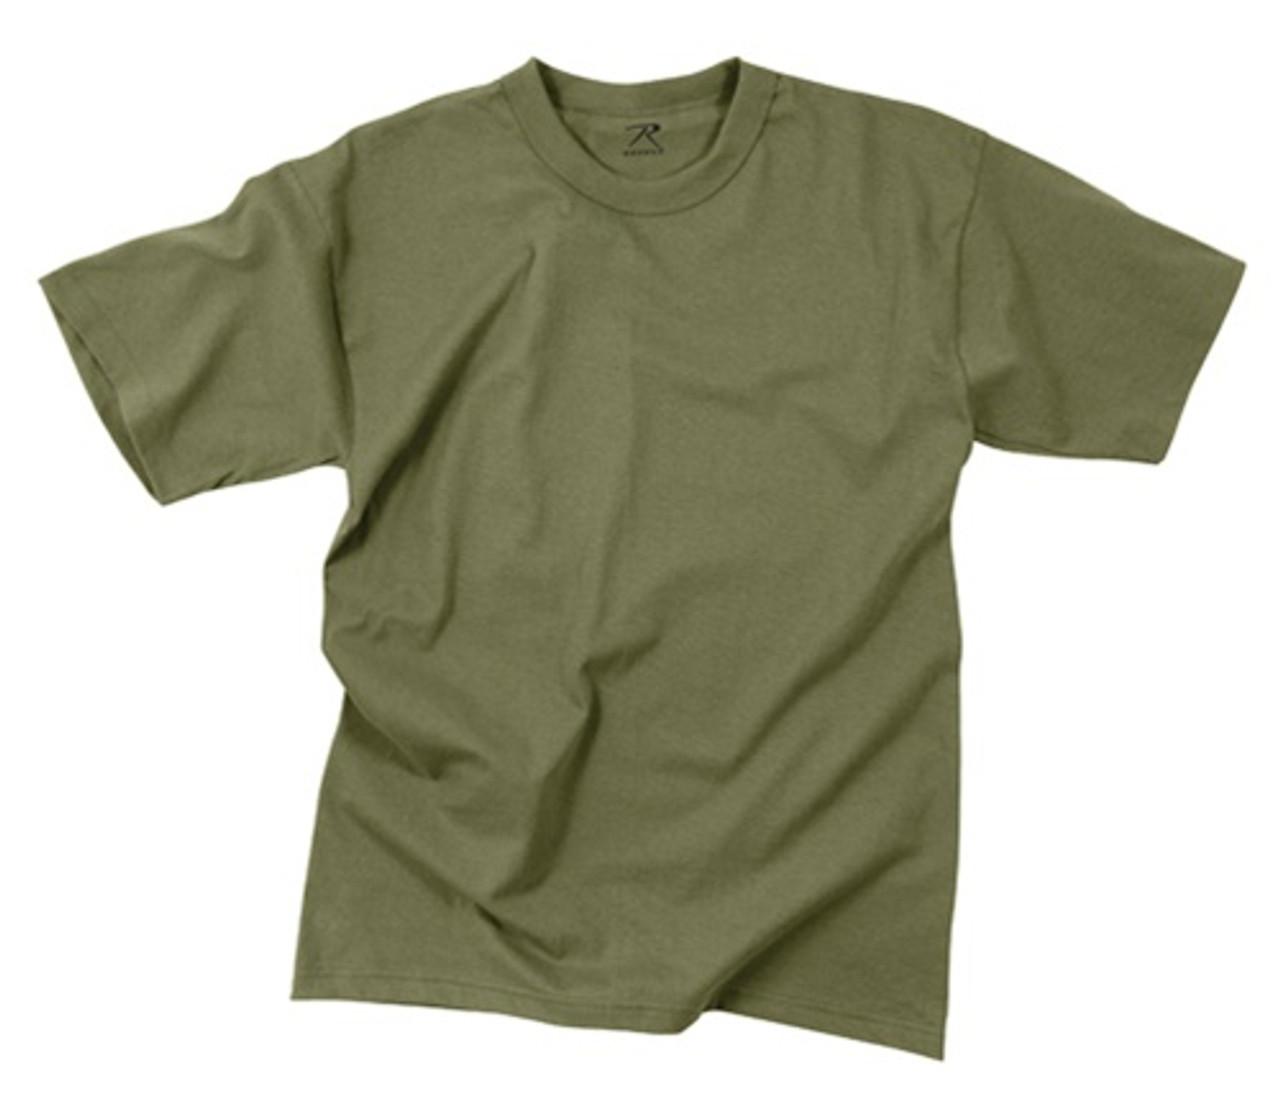 OD GREEN T-SHIRT from Hessen Tactical